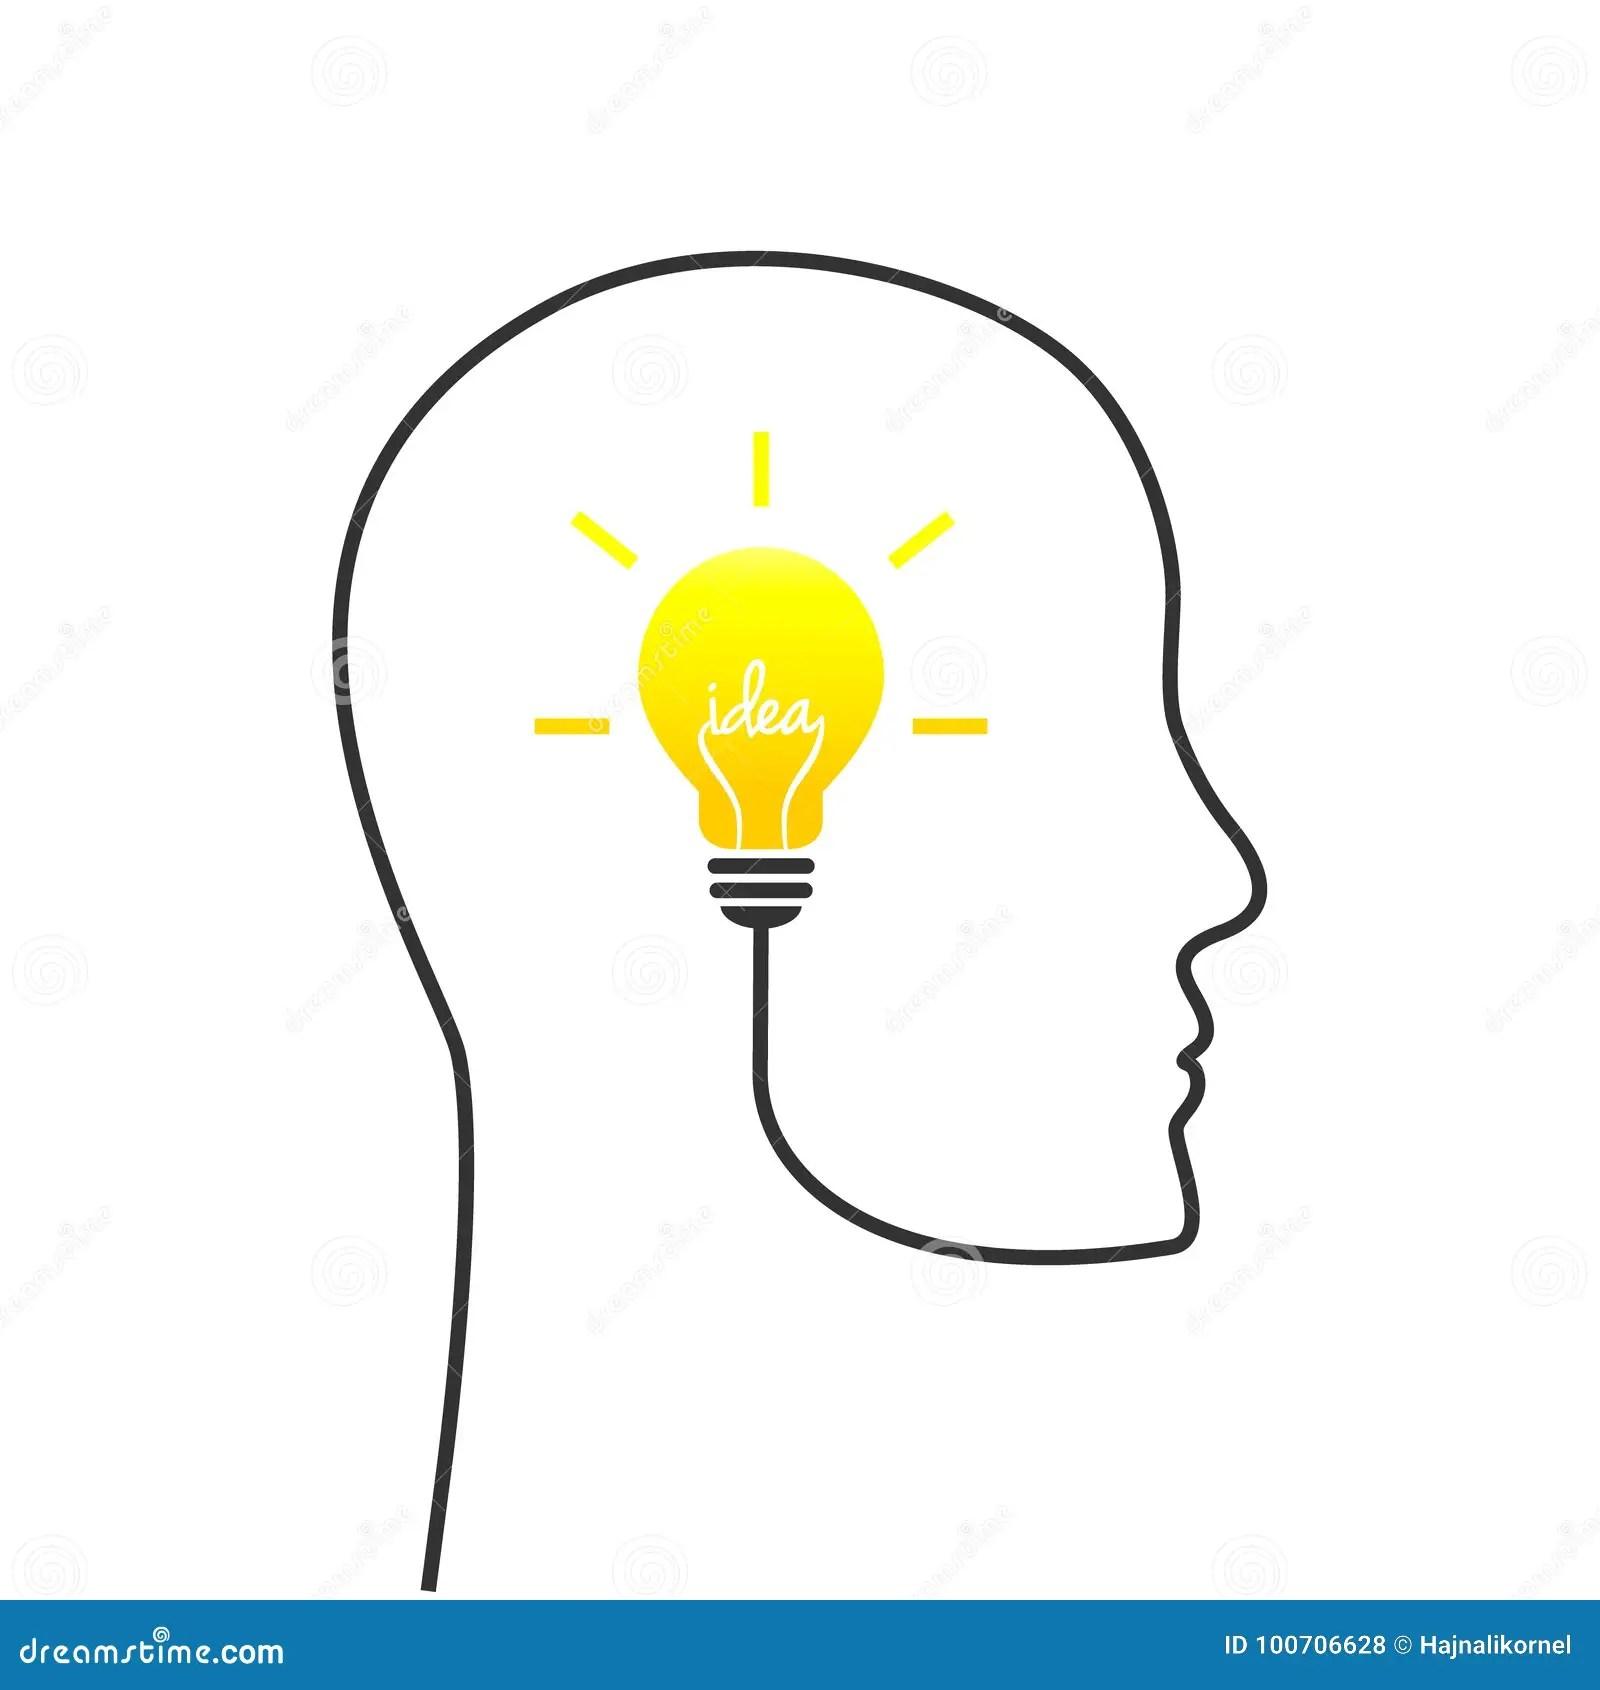 Idea Concept With Head And Lightbulb Stock Vector